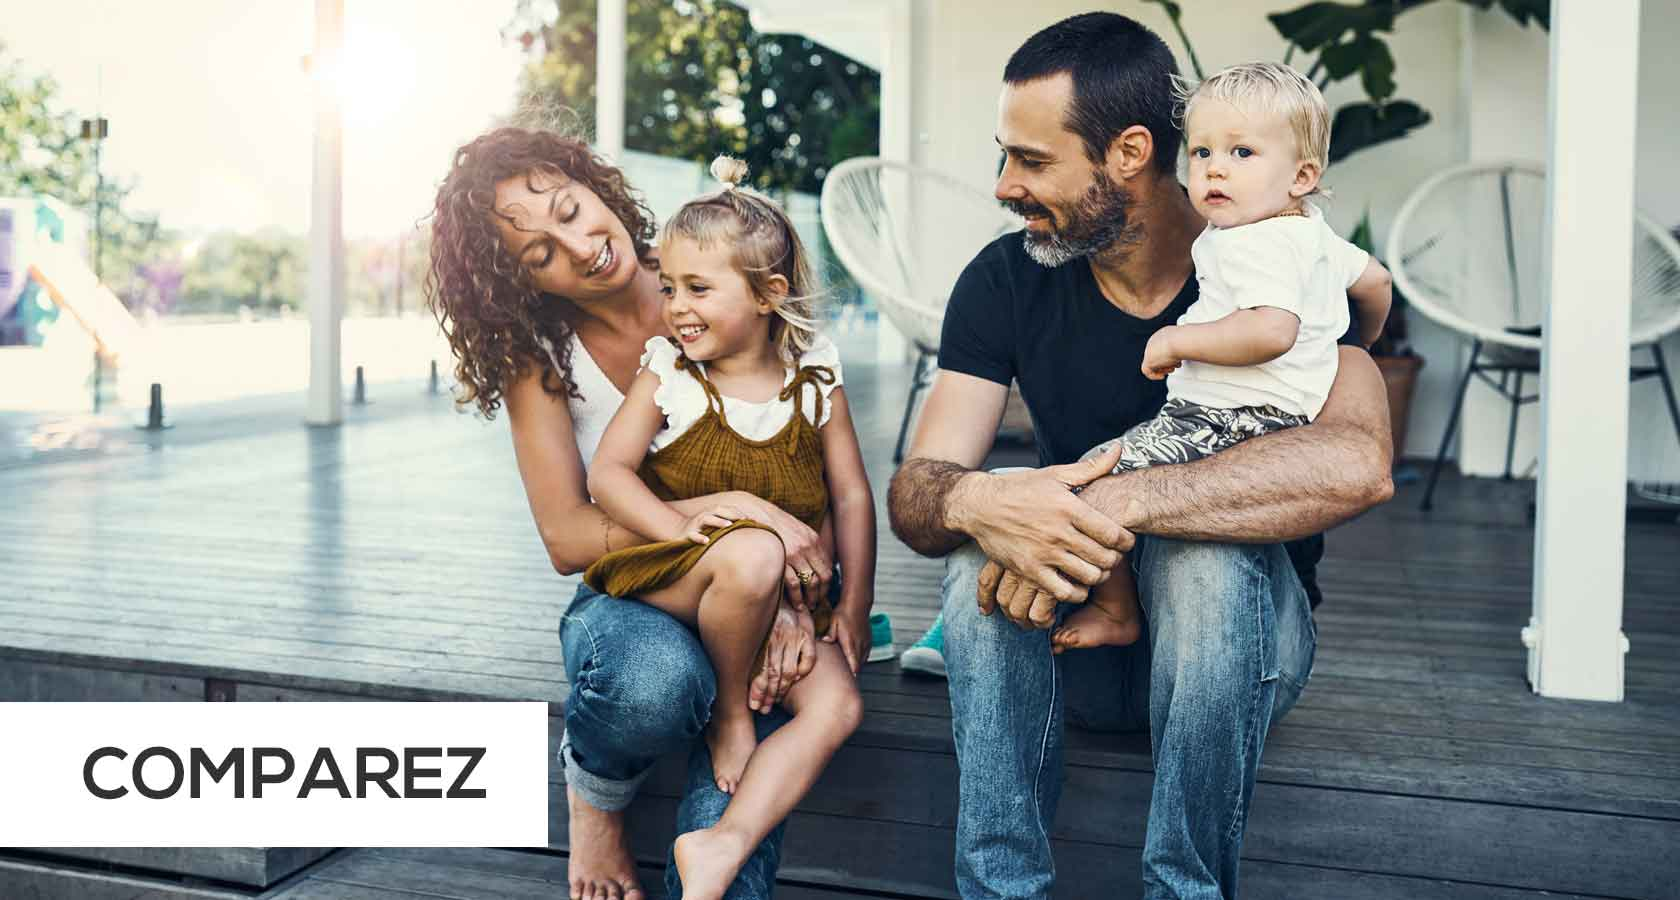 Comparez Home Loan Marketplace